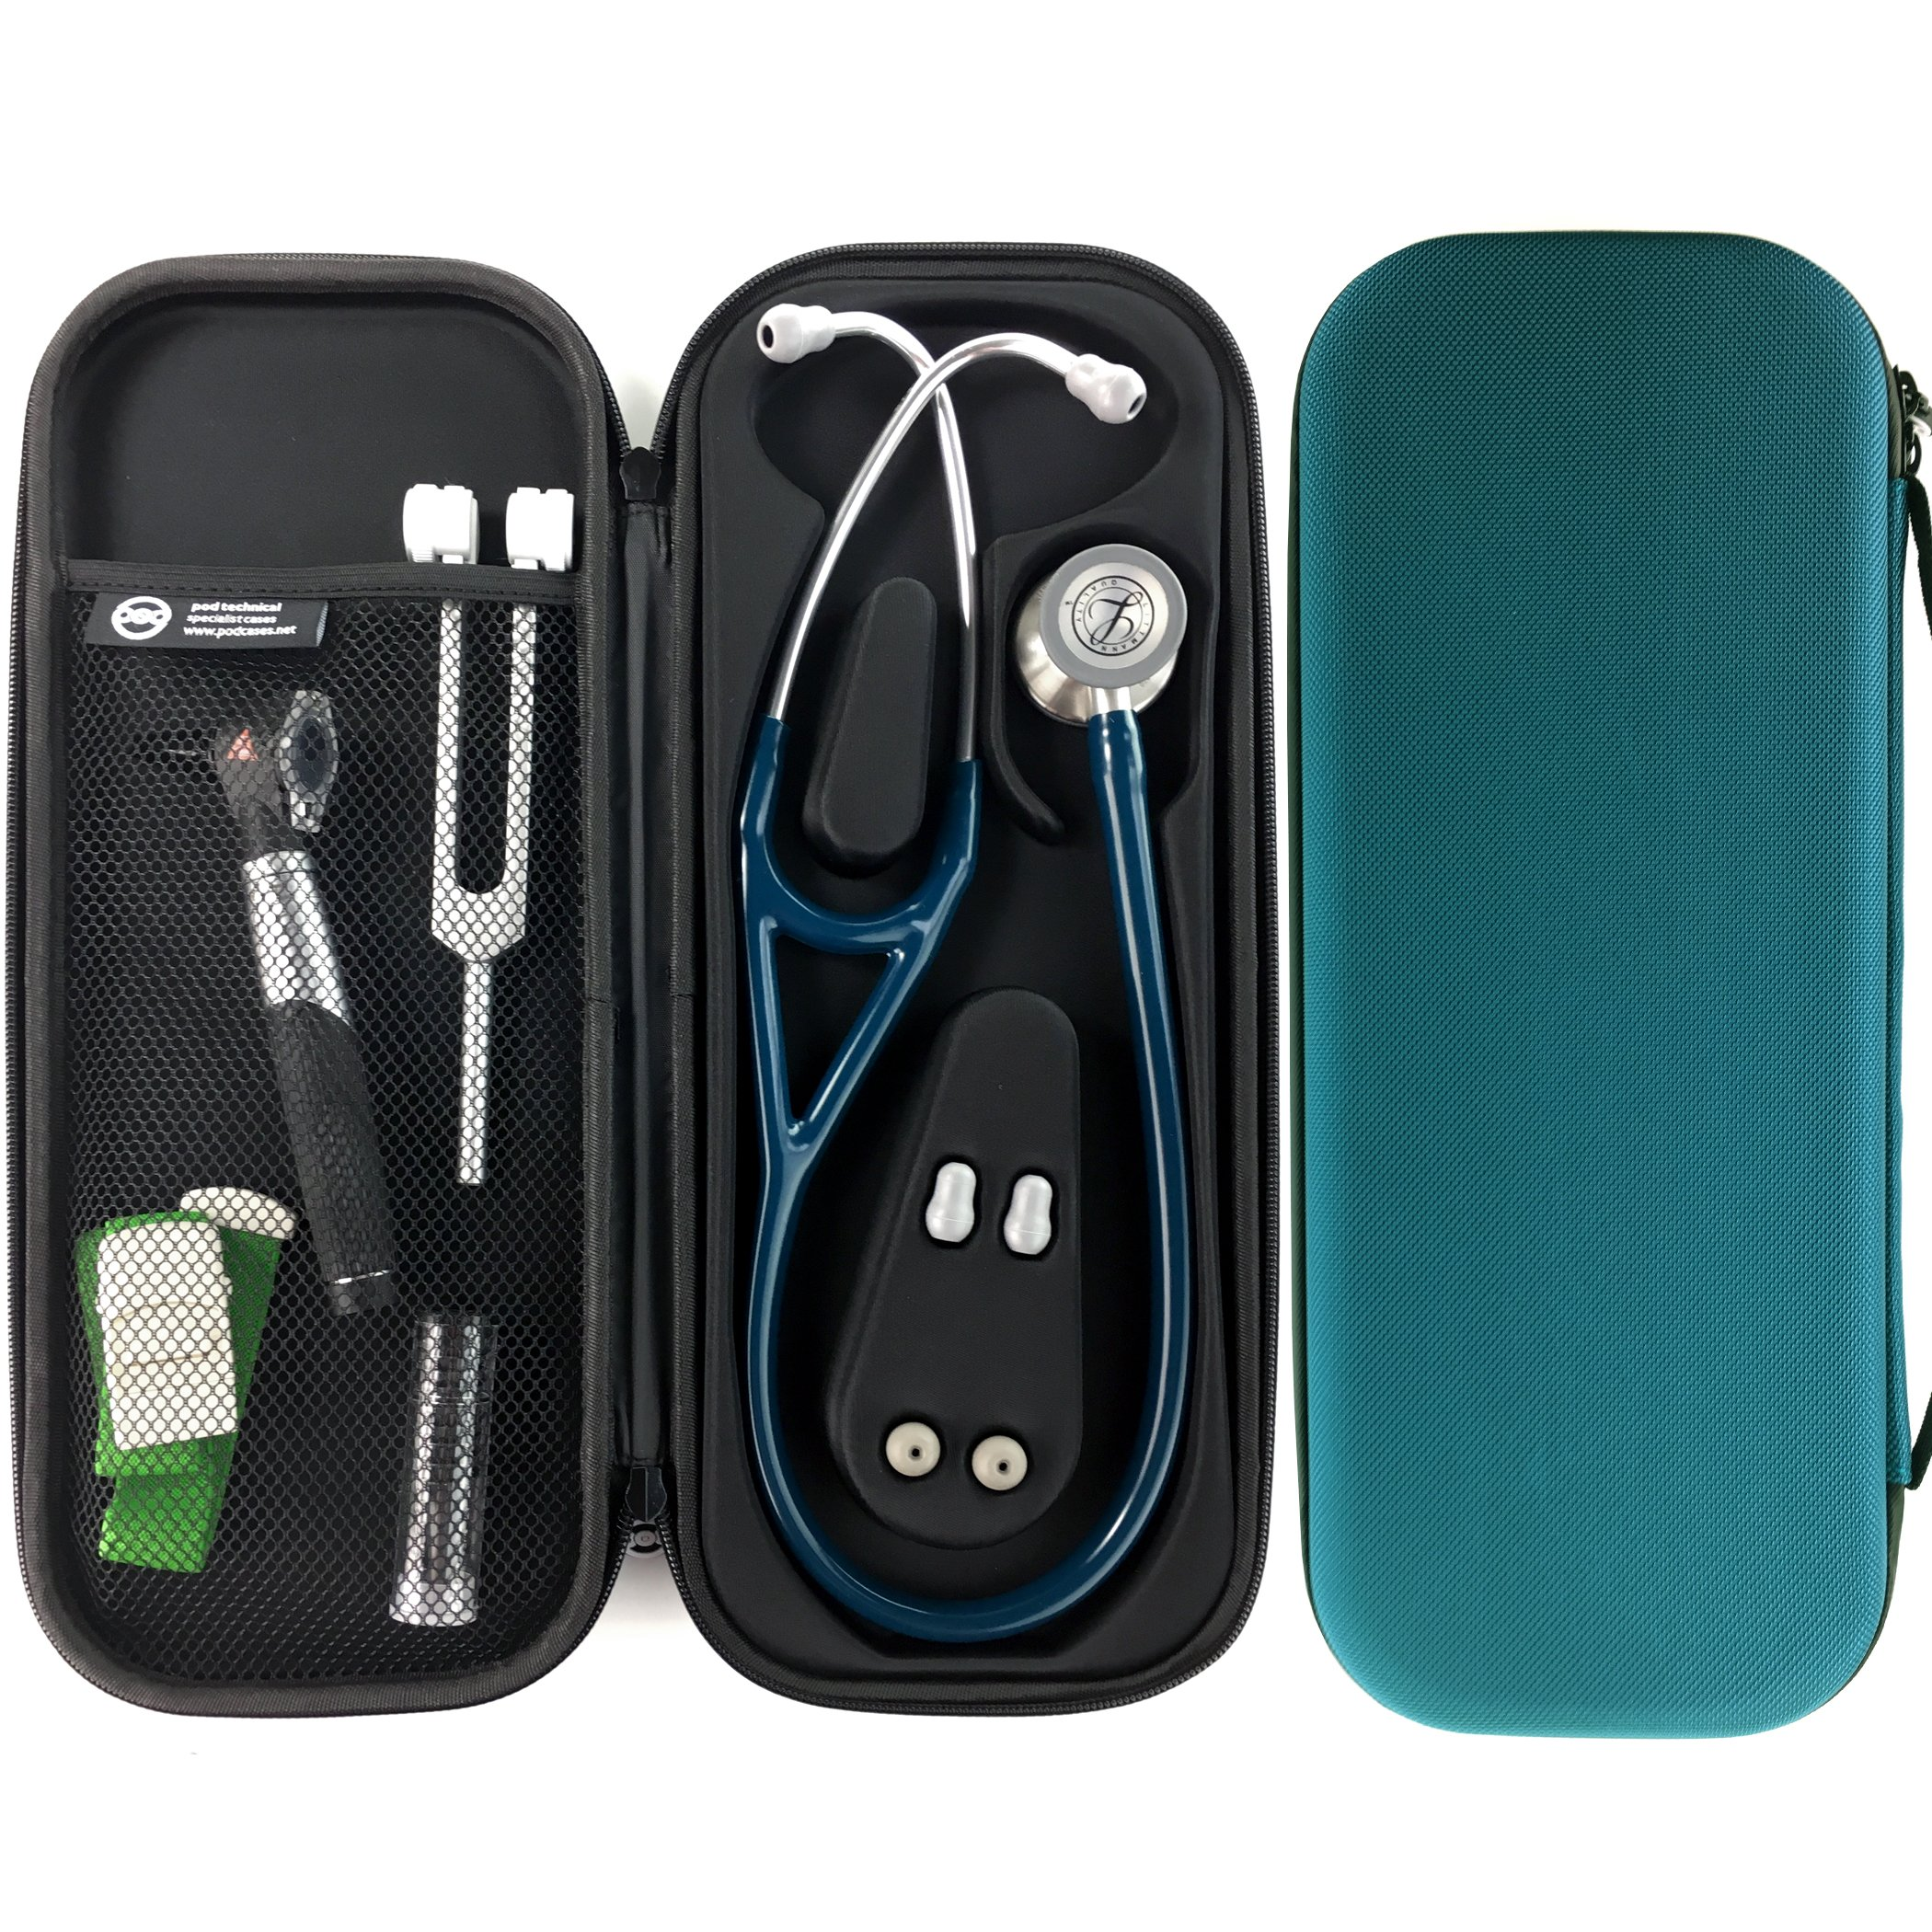 Best Littmann Cardiology Stethoscope 2019